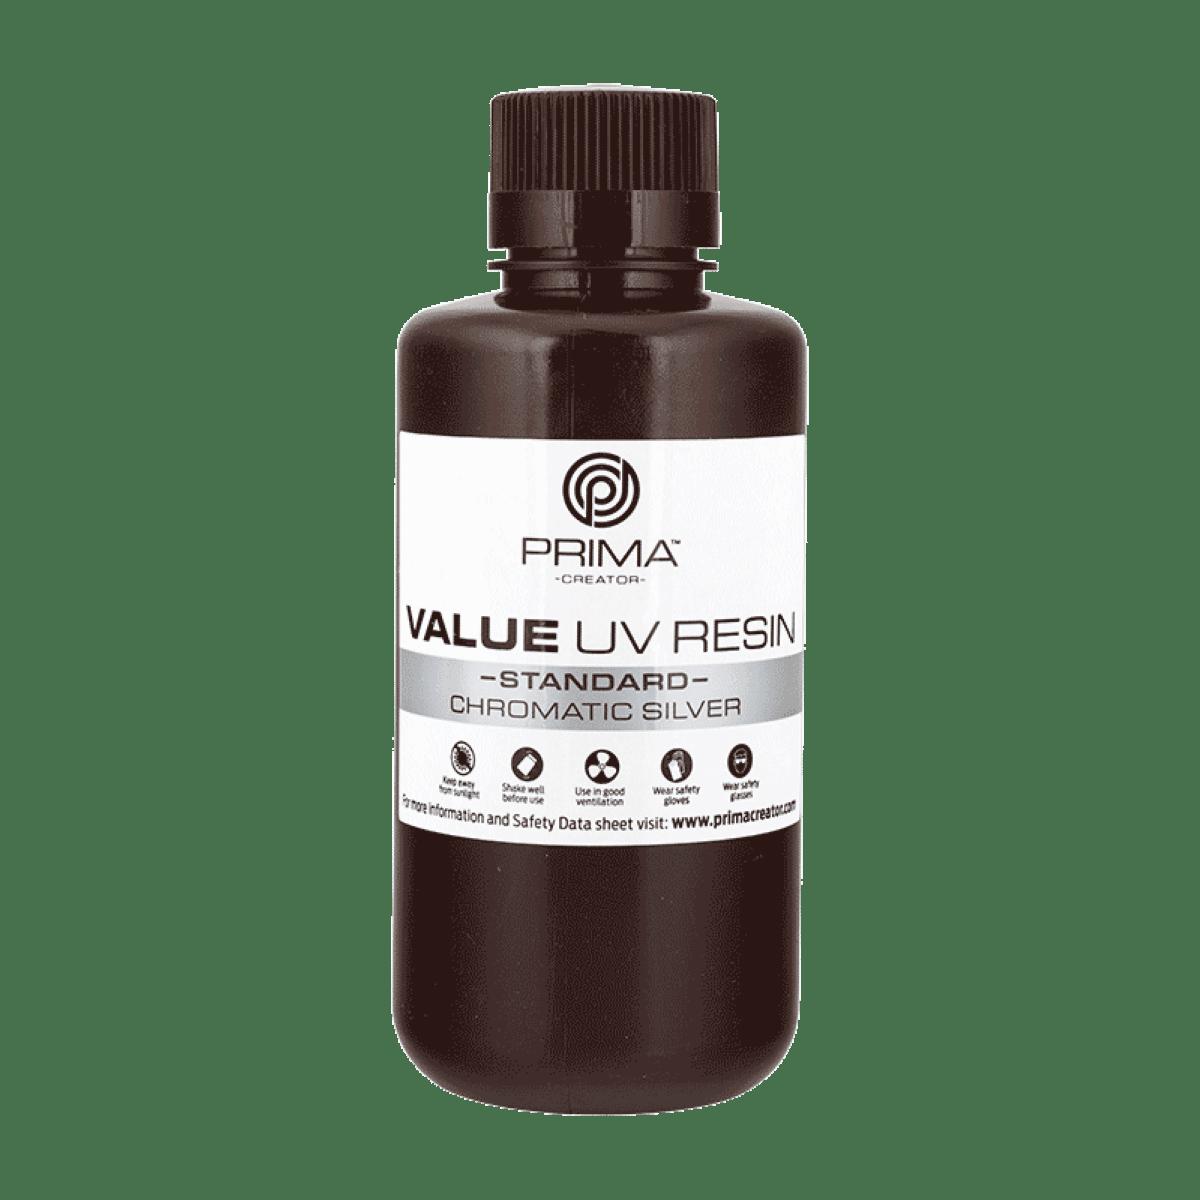 Image of PrimaCreator Value UV / DLP Resin - 500 ml - Chromatic Silver